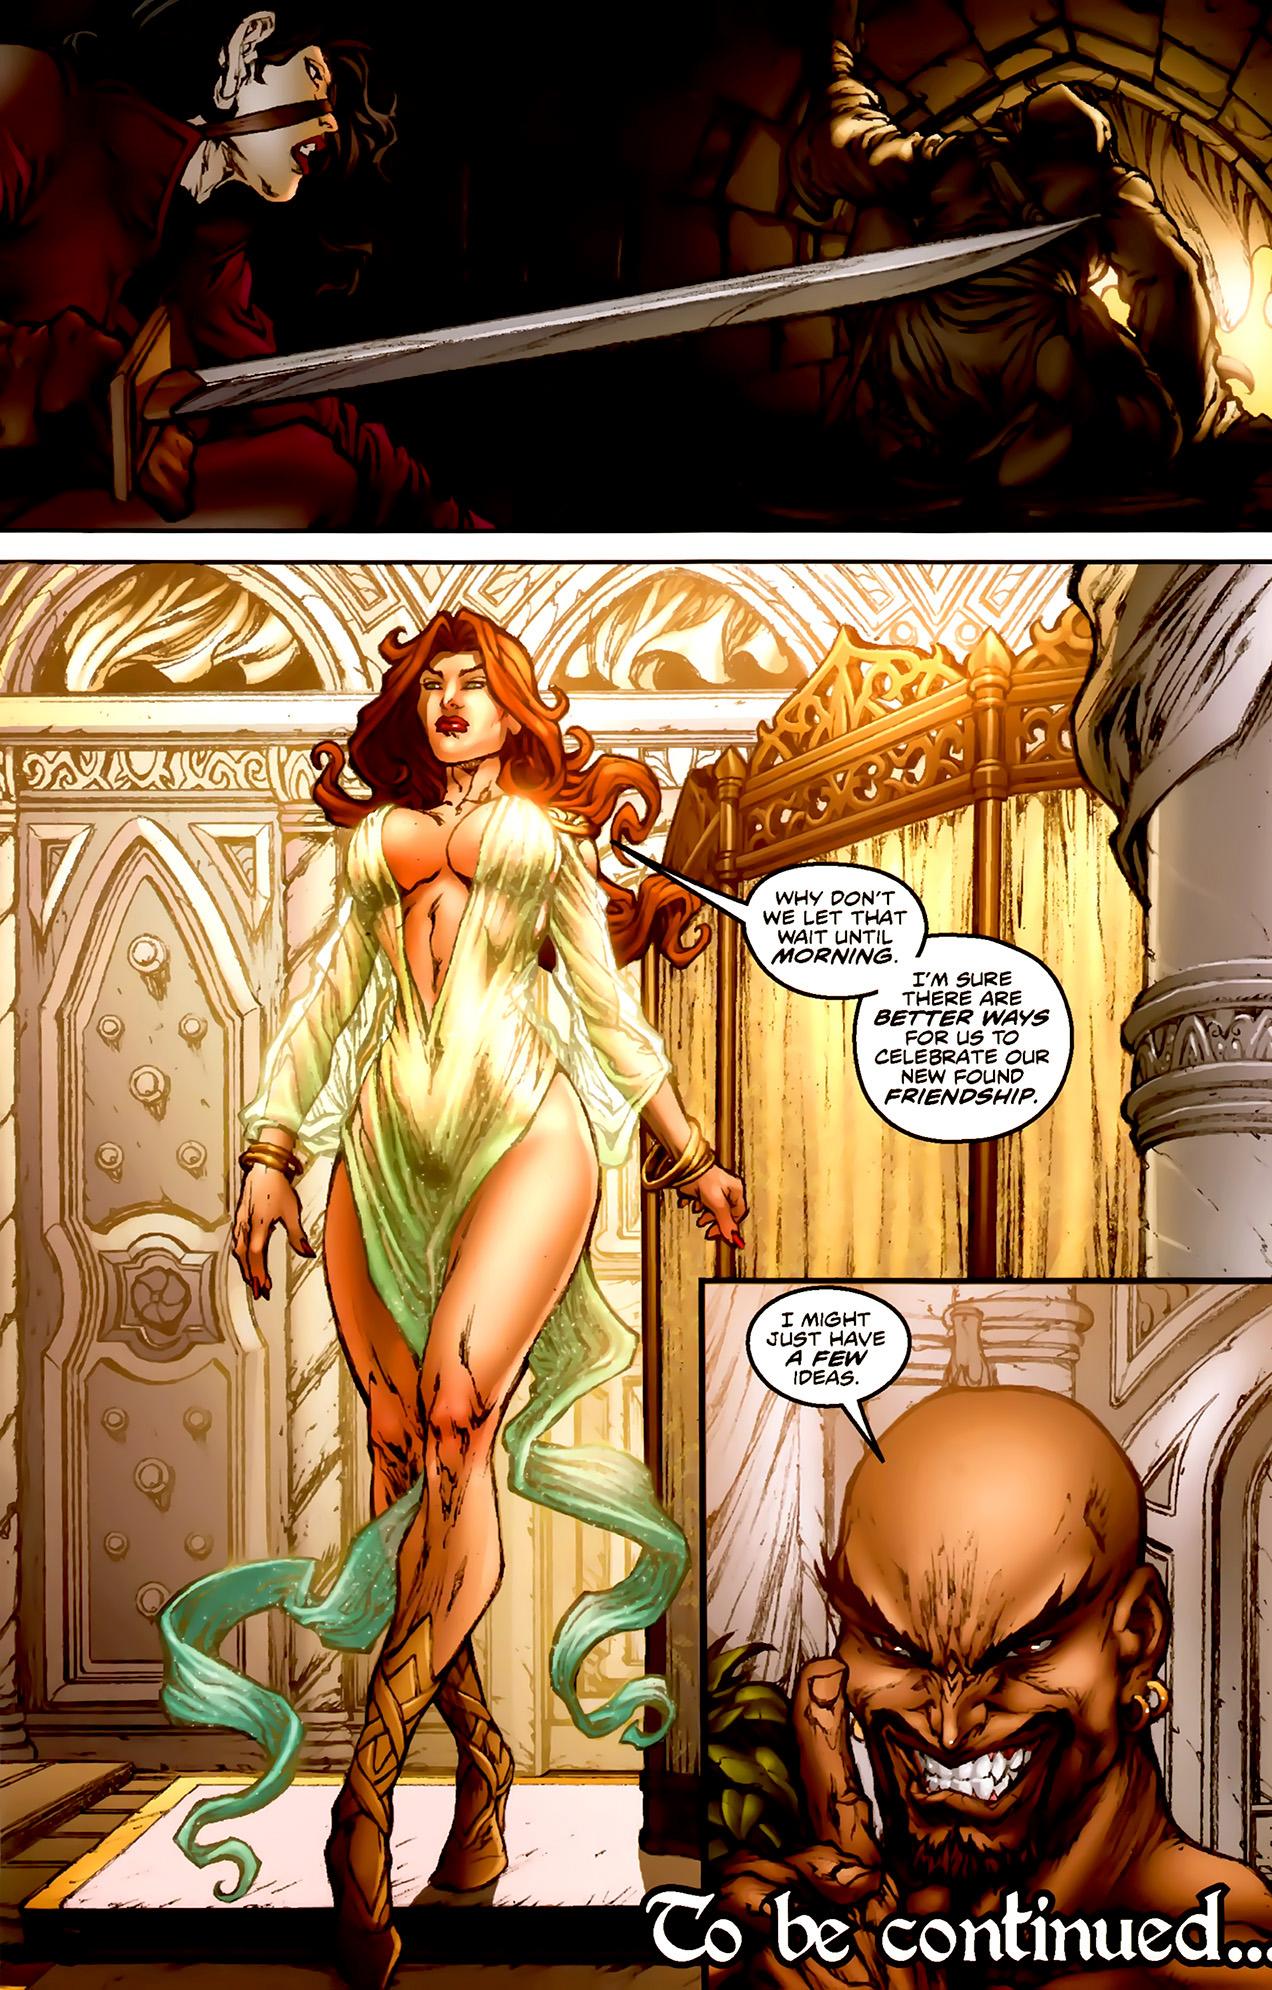 Read online 1001 Arabian Nights: The Adventures of Sinbad comic -  Issue #1 - 27